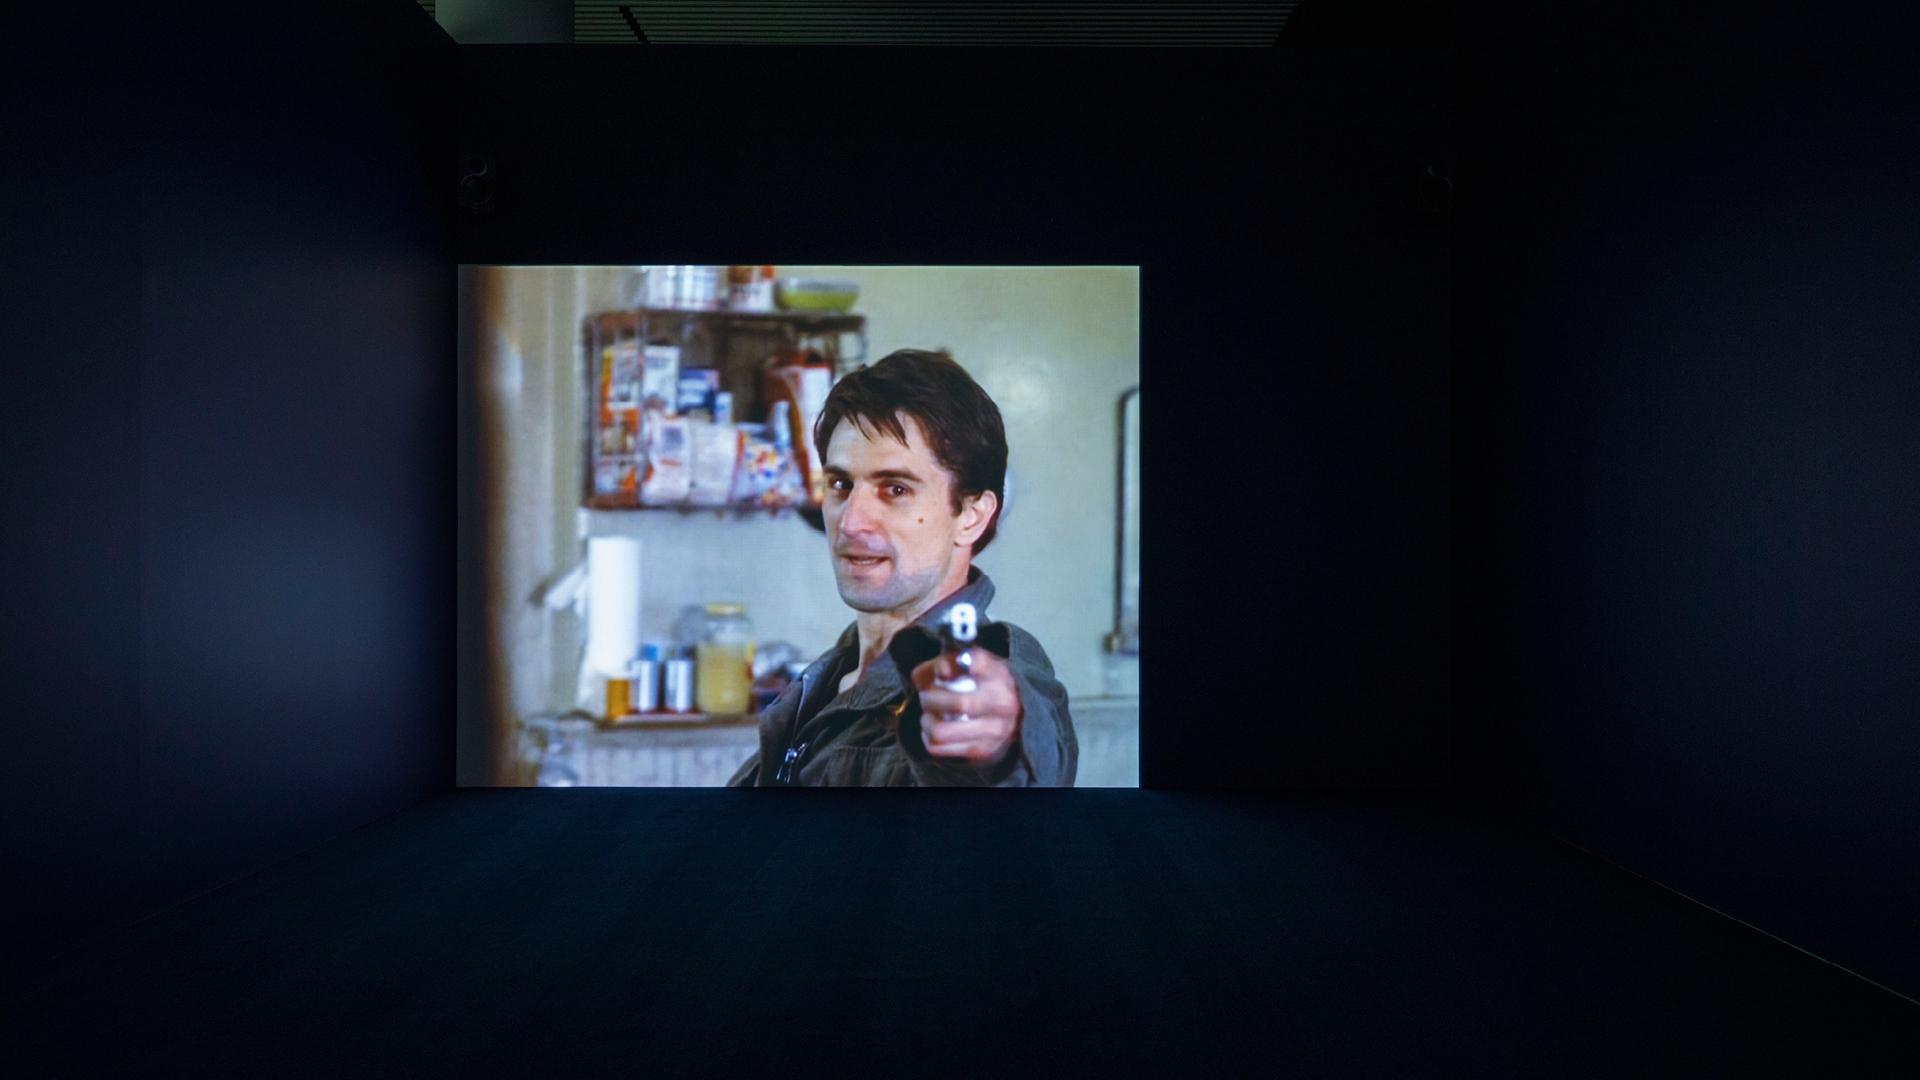 Video artist Douglas Gordon showcases extensive solo exhibition in Denmark